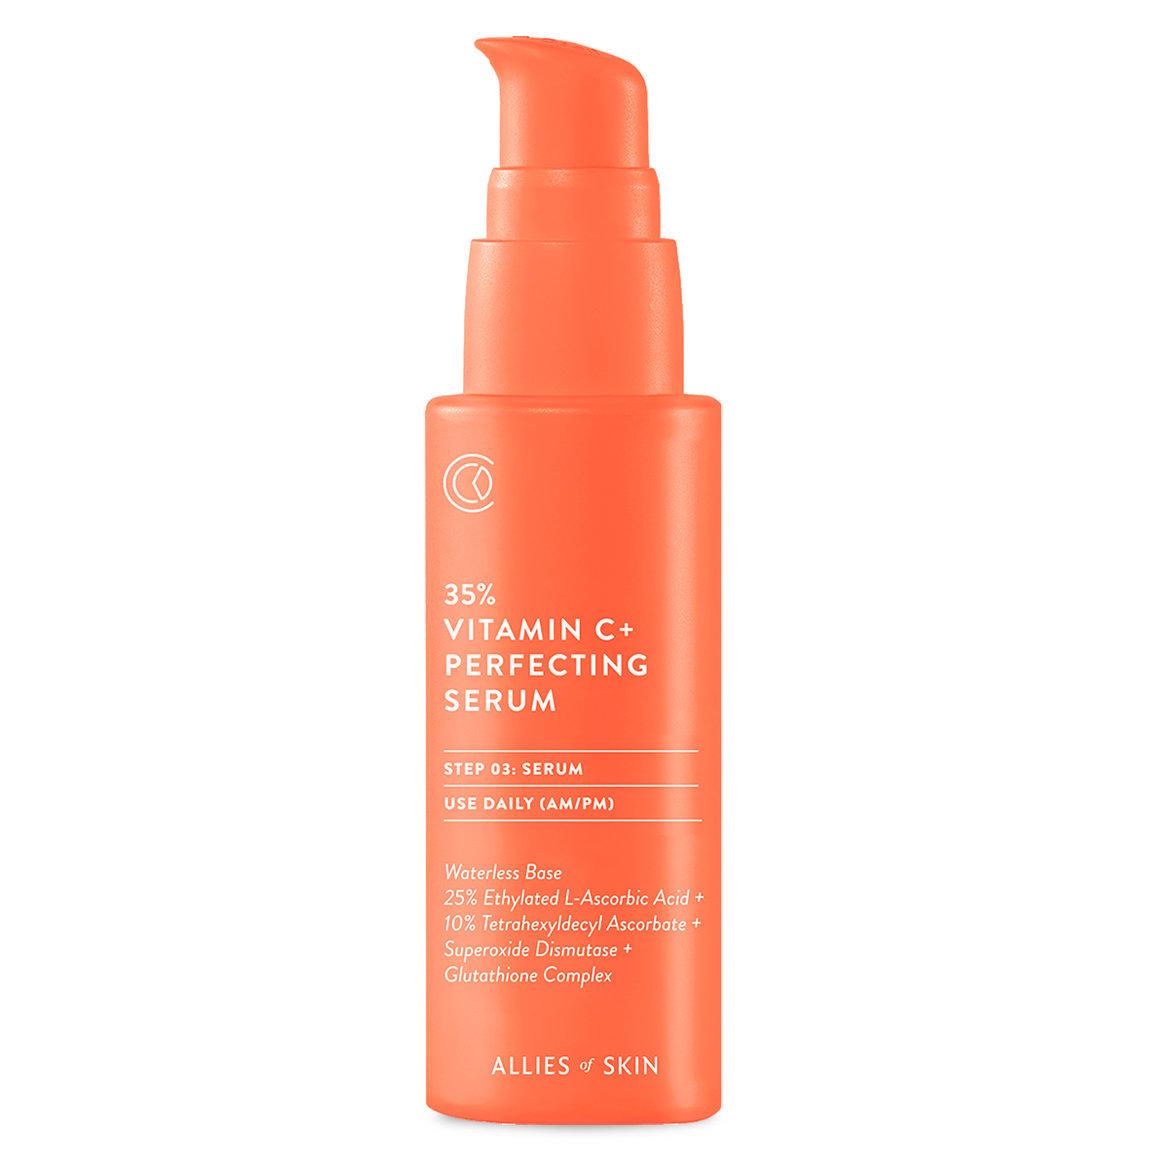 Allies of Skin 35% Vitamin C+ Perfecting Serum alternative view 1 - product swatch.